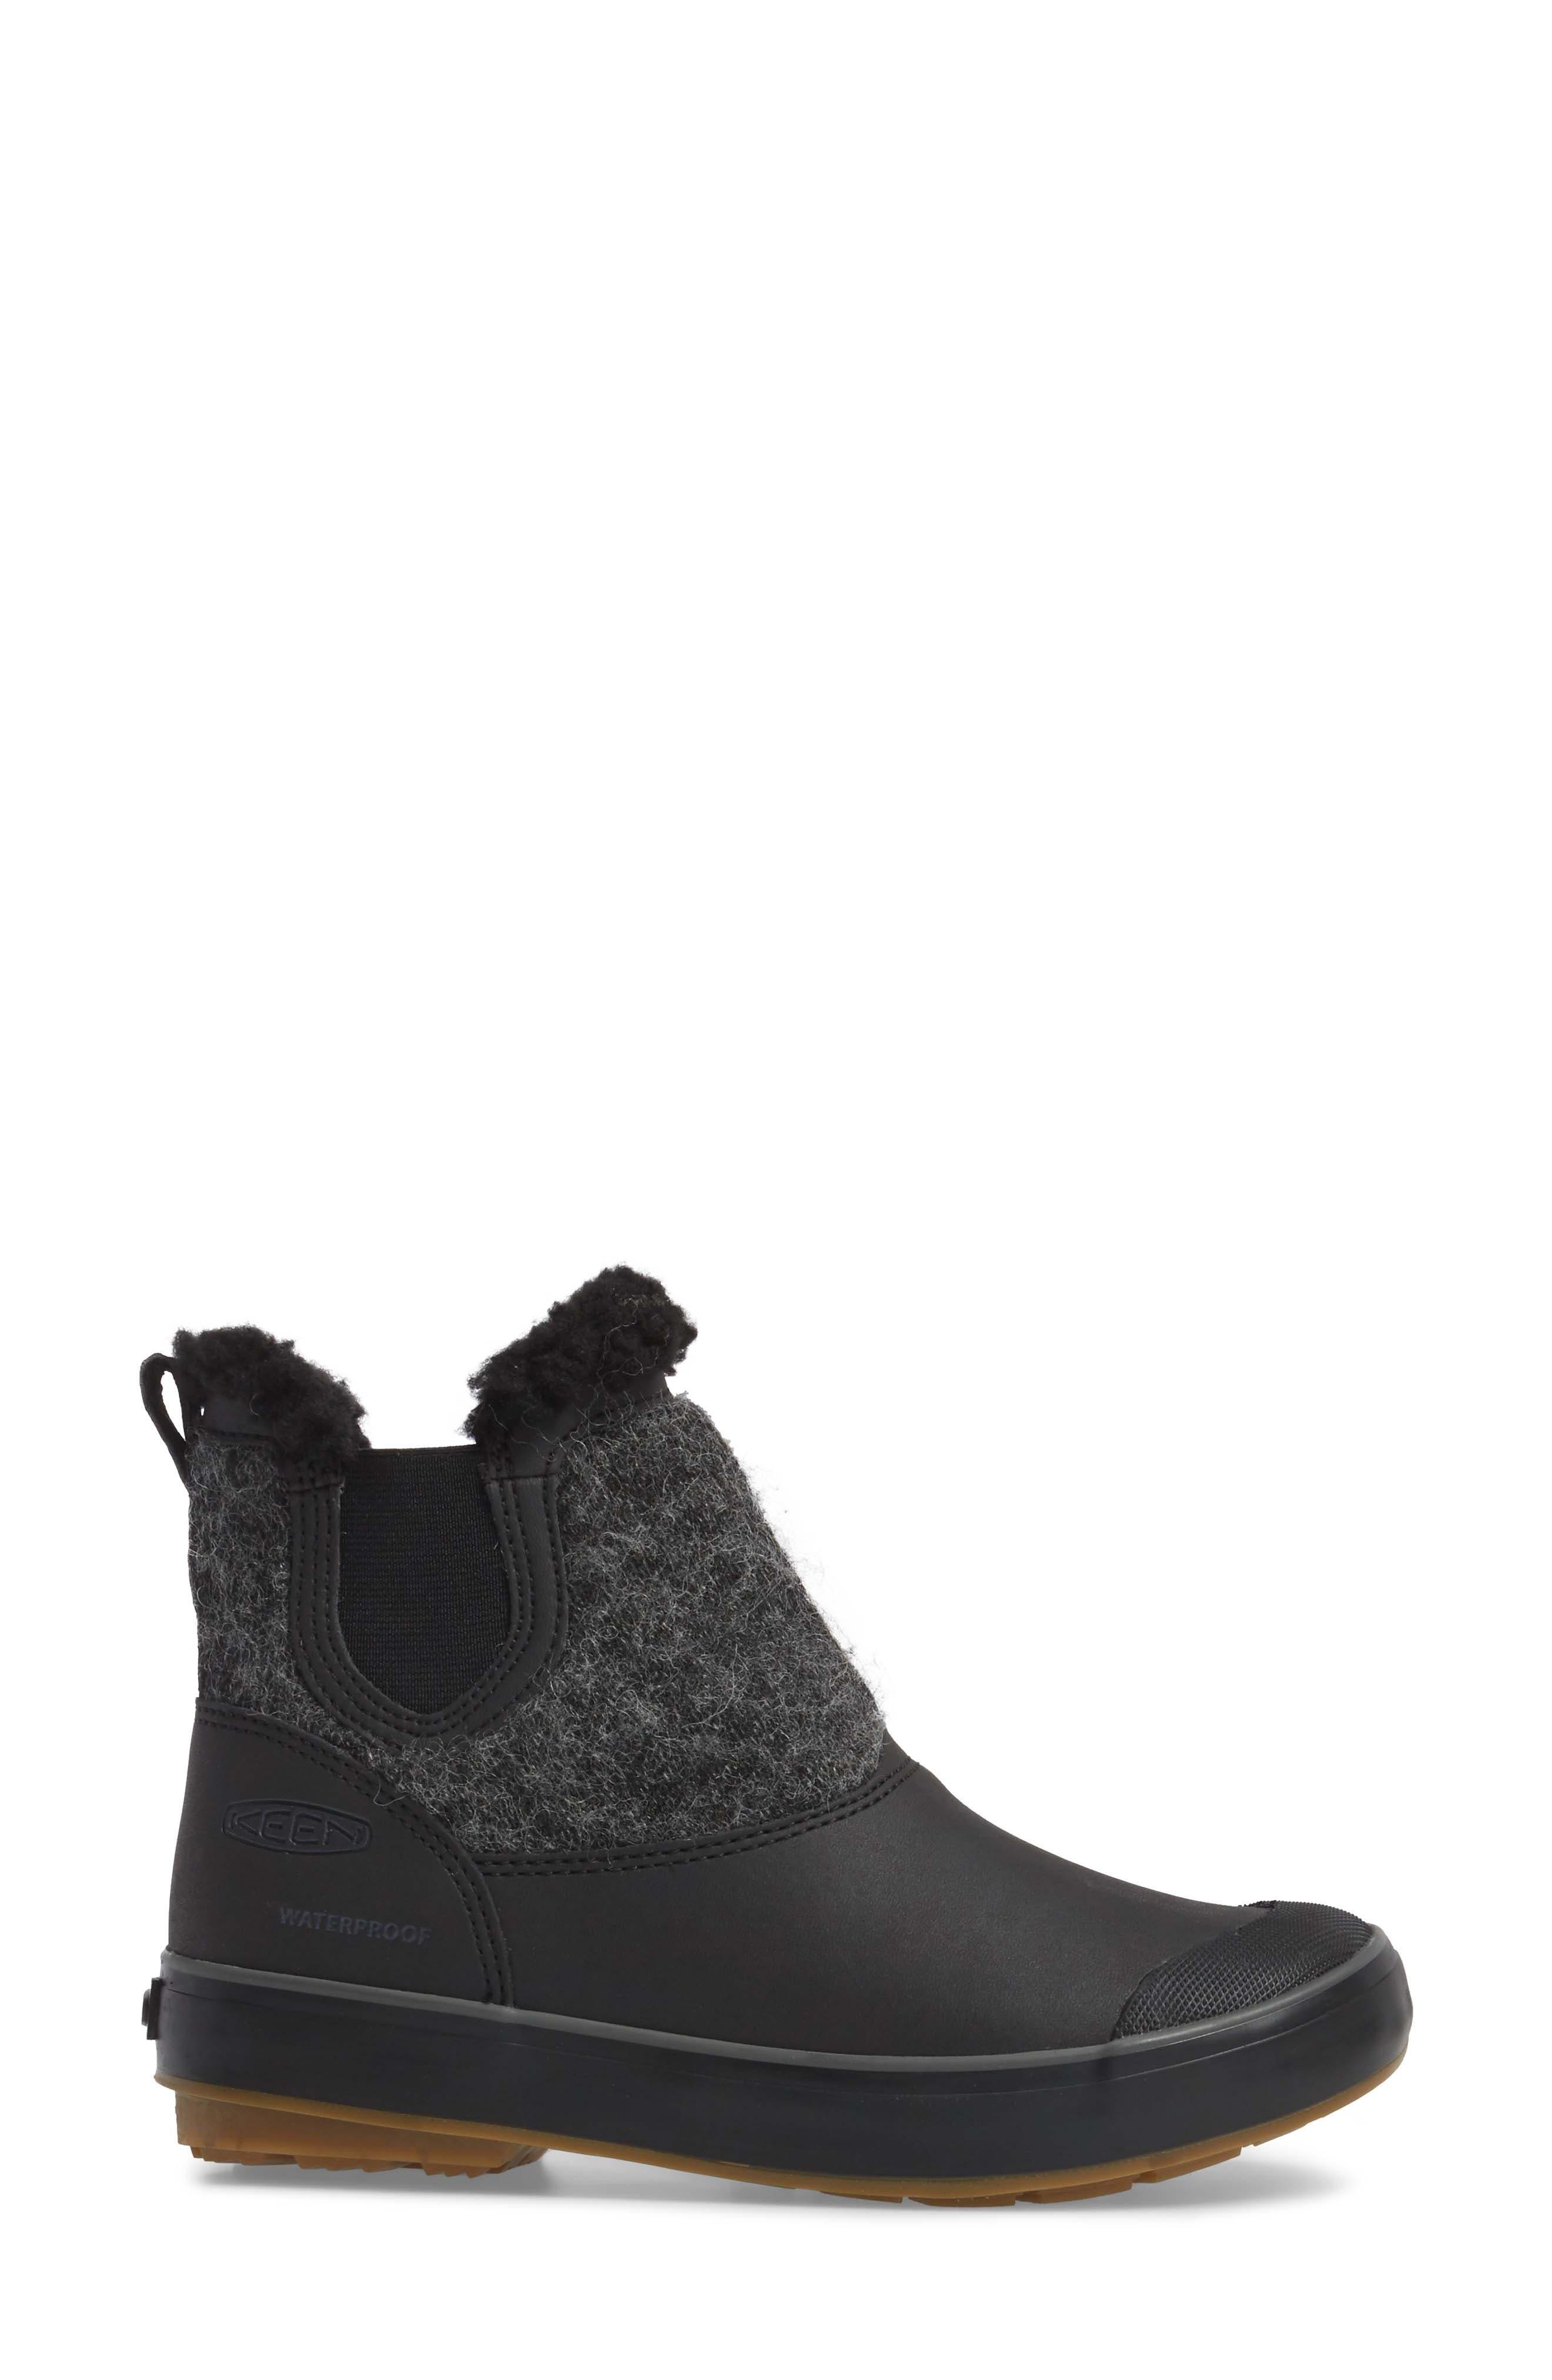 Elsa Chelsea Waterproof Faux Fur Lined Boot,                             Alternate thumbnail 3, color,                             Black Wool Leather